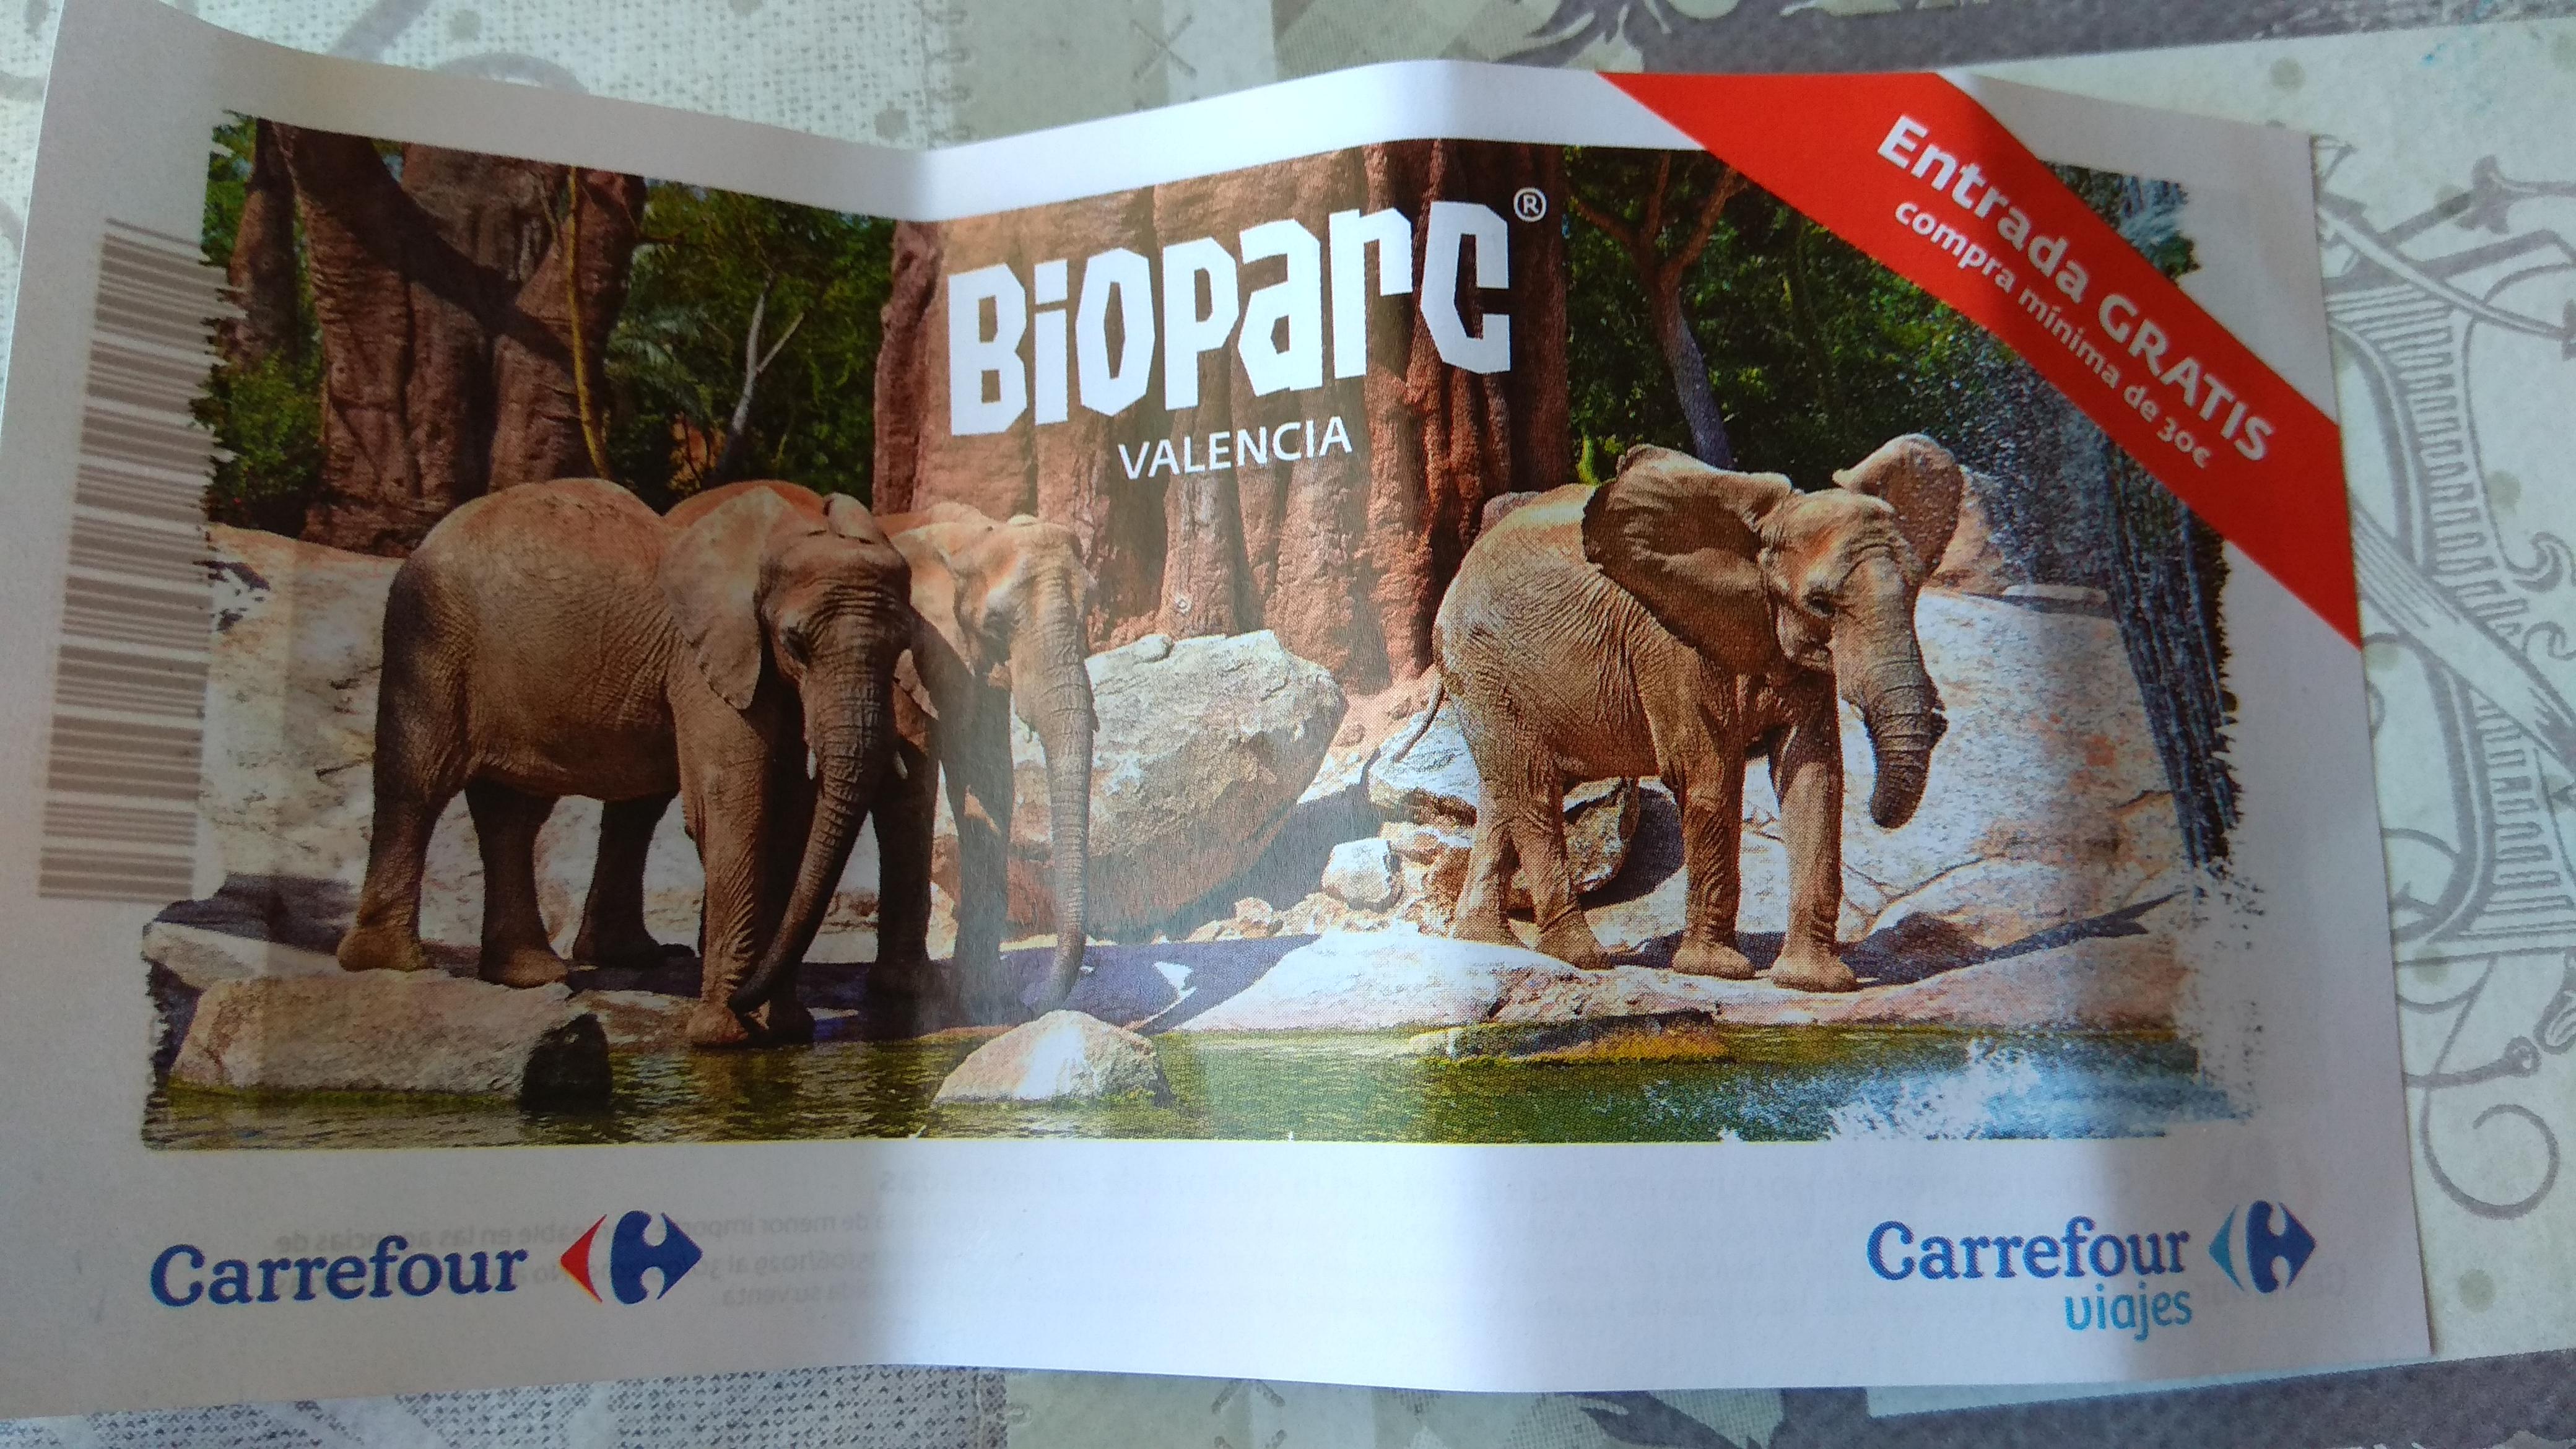 Bioparc Valencia entrada gratis compra minima de 30 euros.